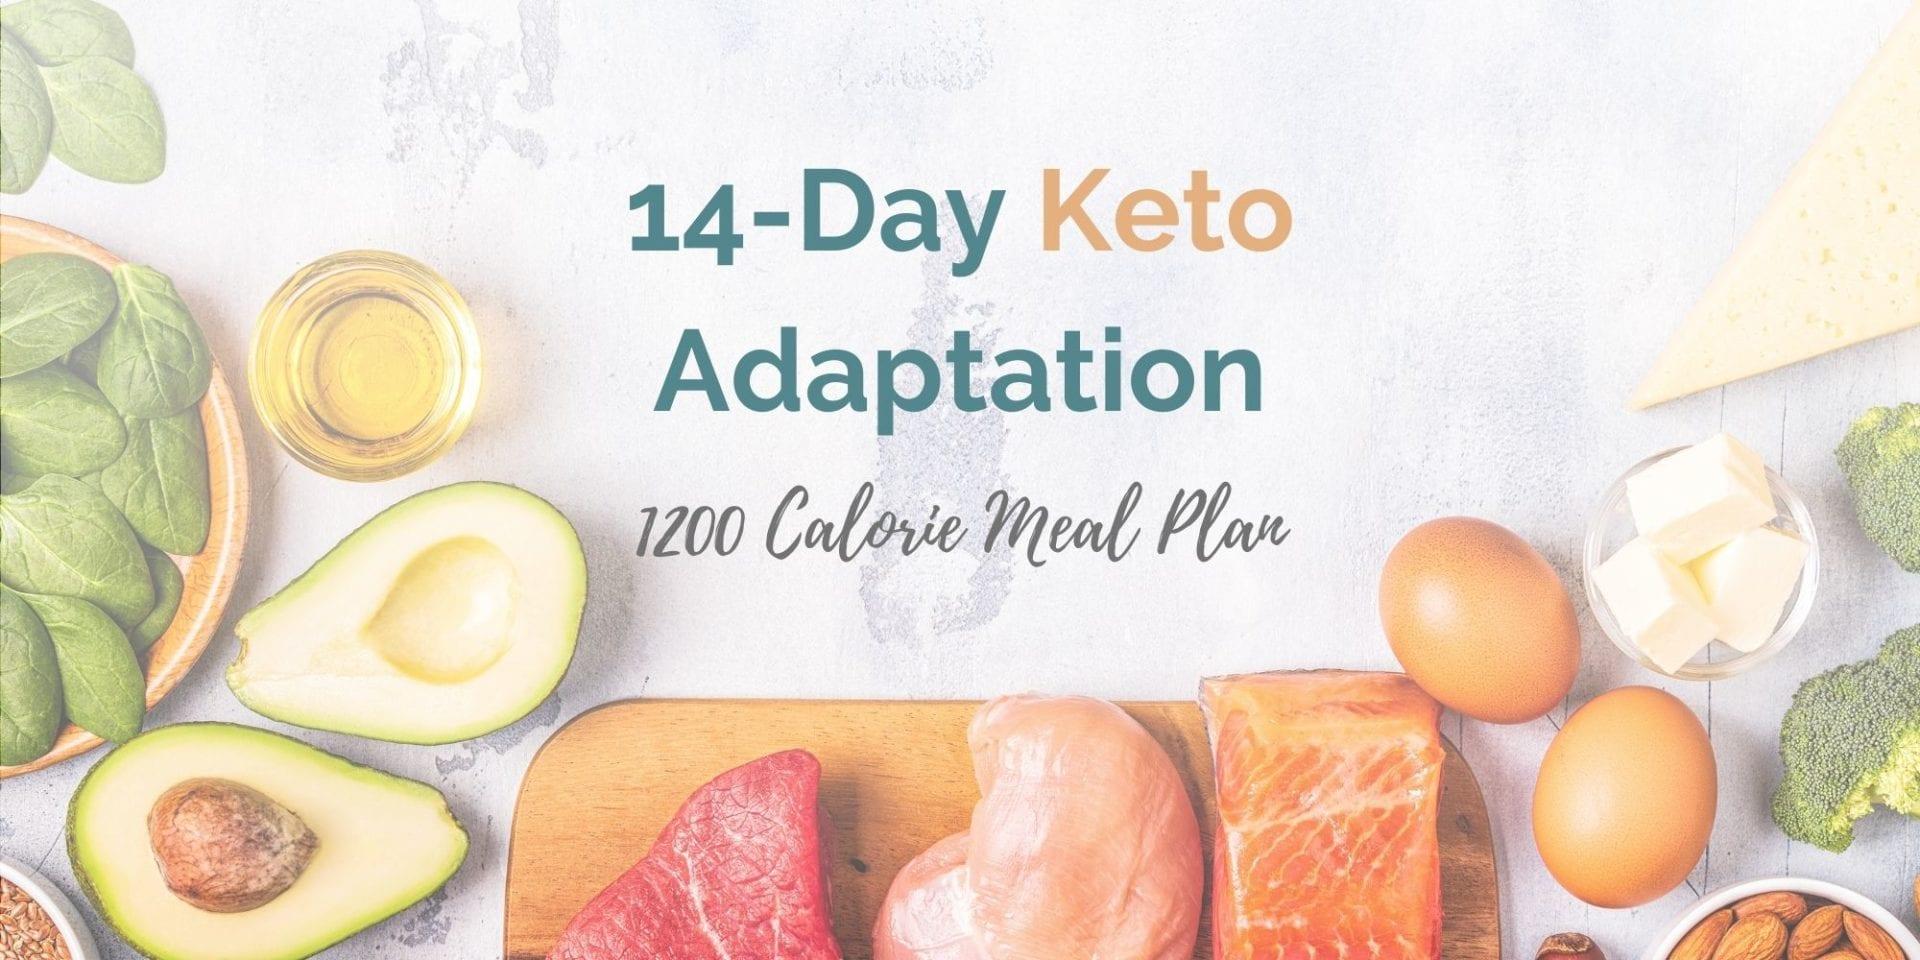 1,200 Calorie 14-Day Keto Adaptation Program